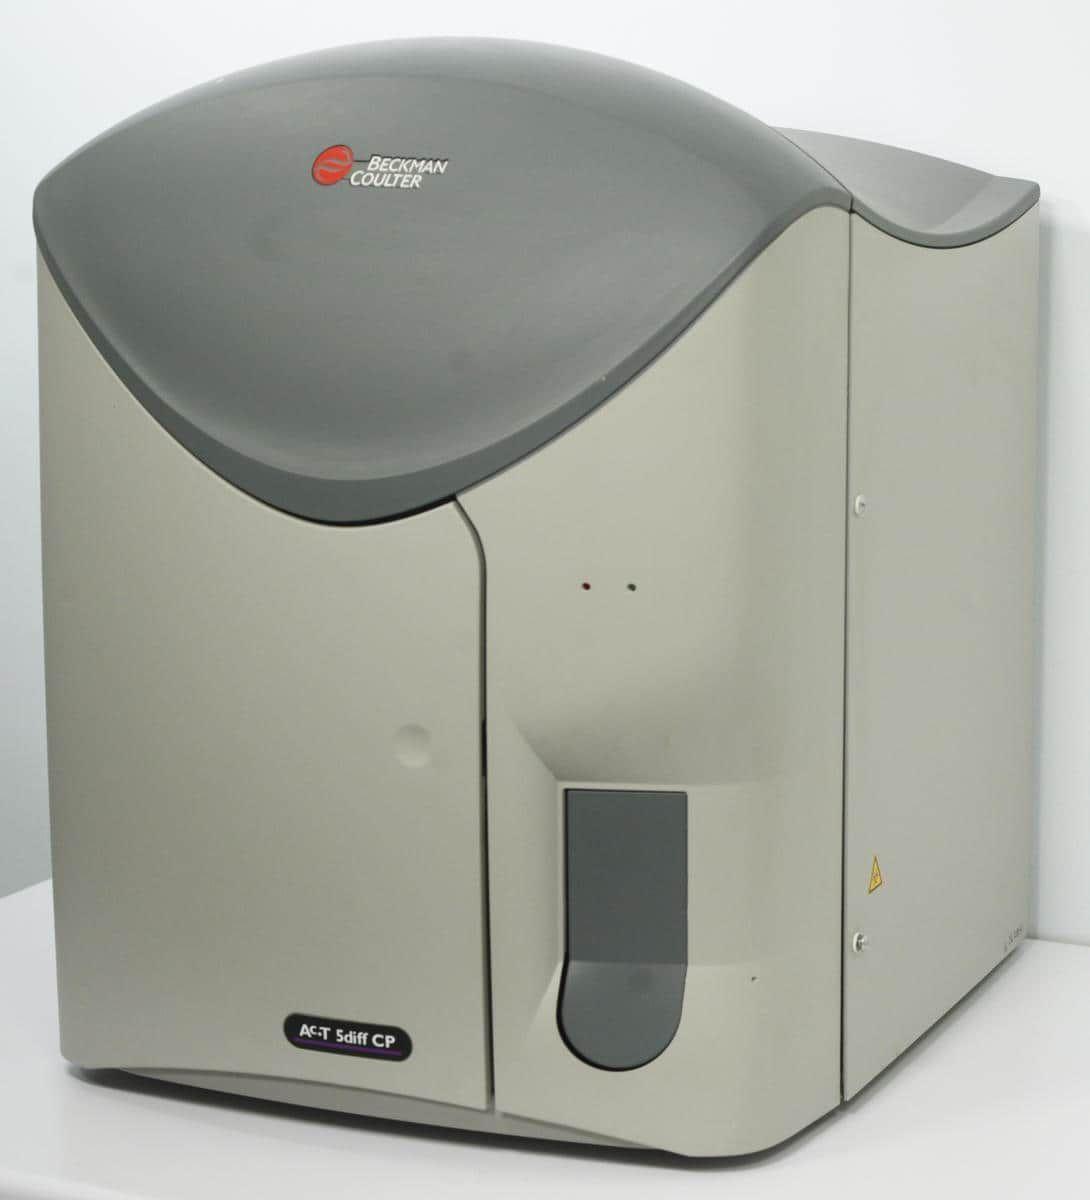 Beckman Coulter Act Diff 5 CP  (Cap Pierce) Hematology Analyzer